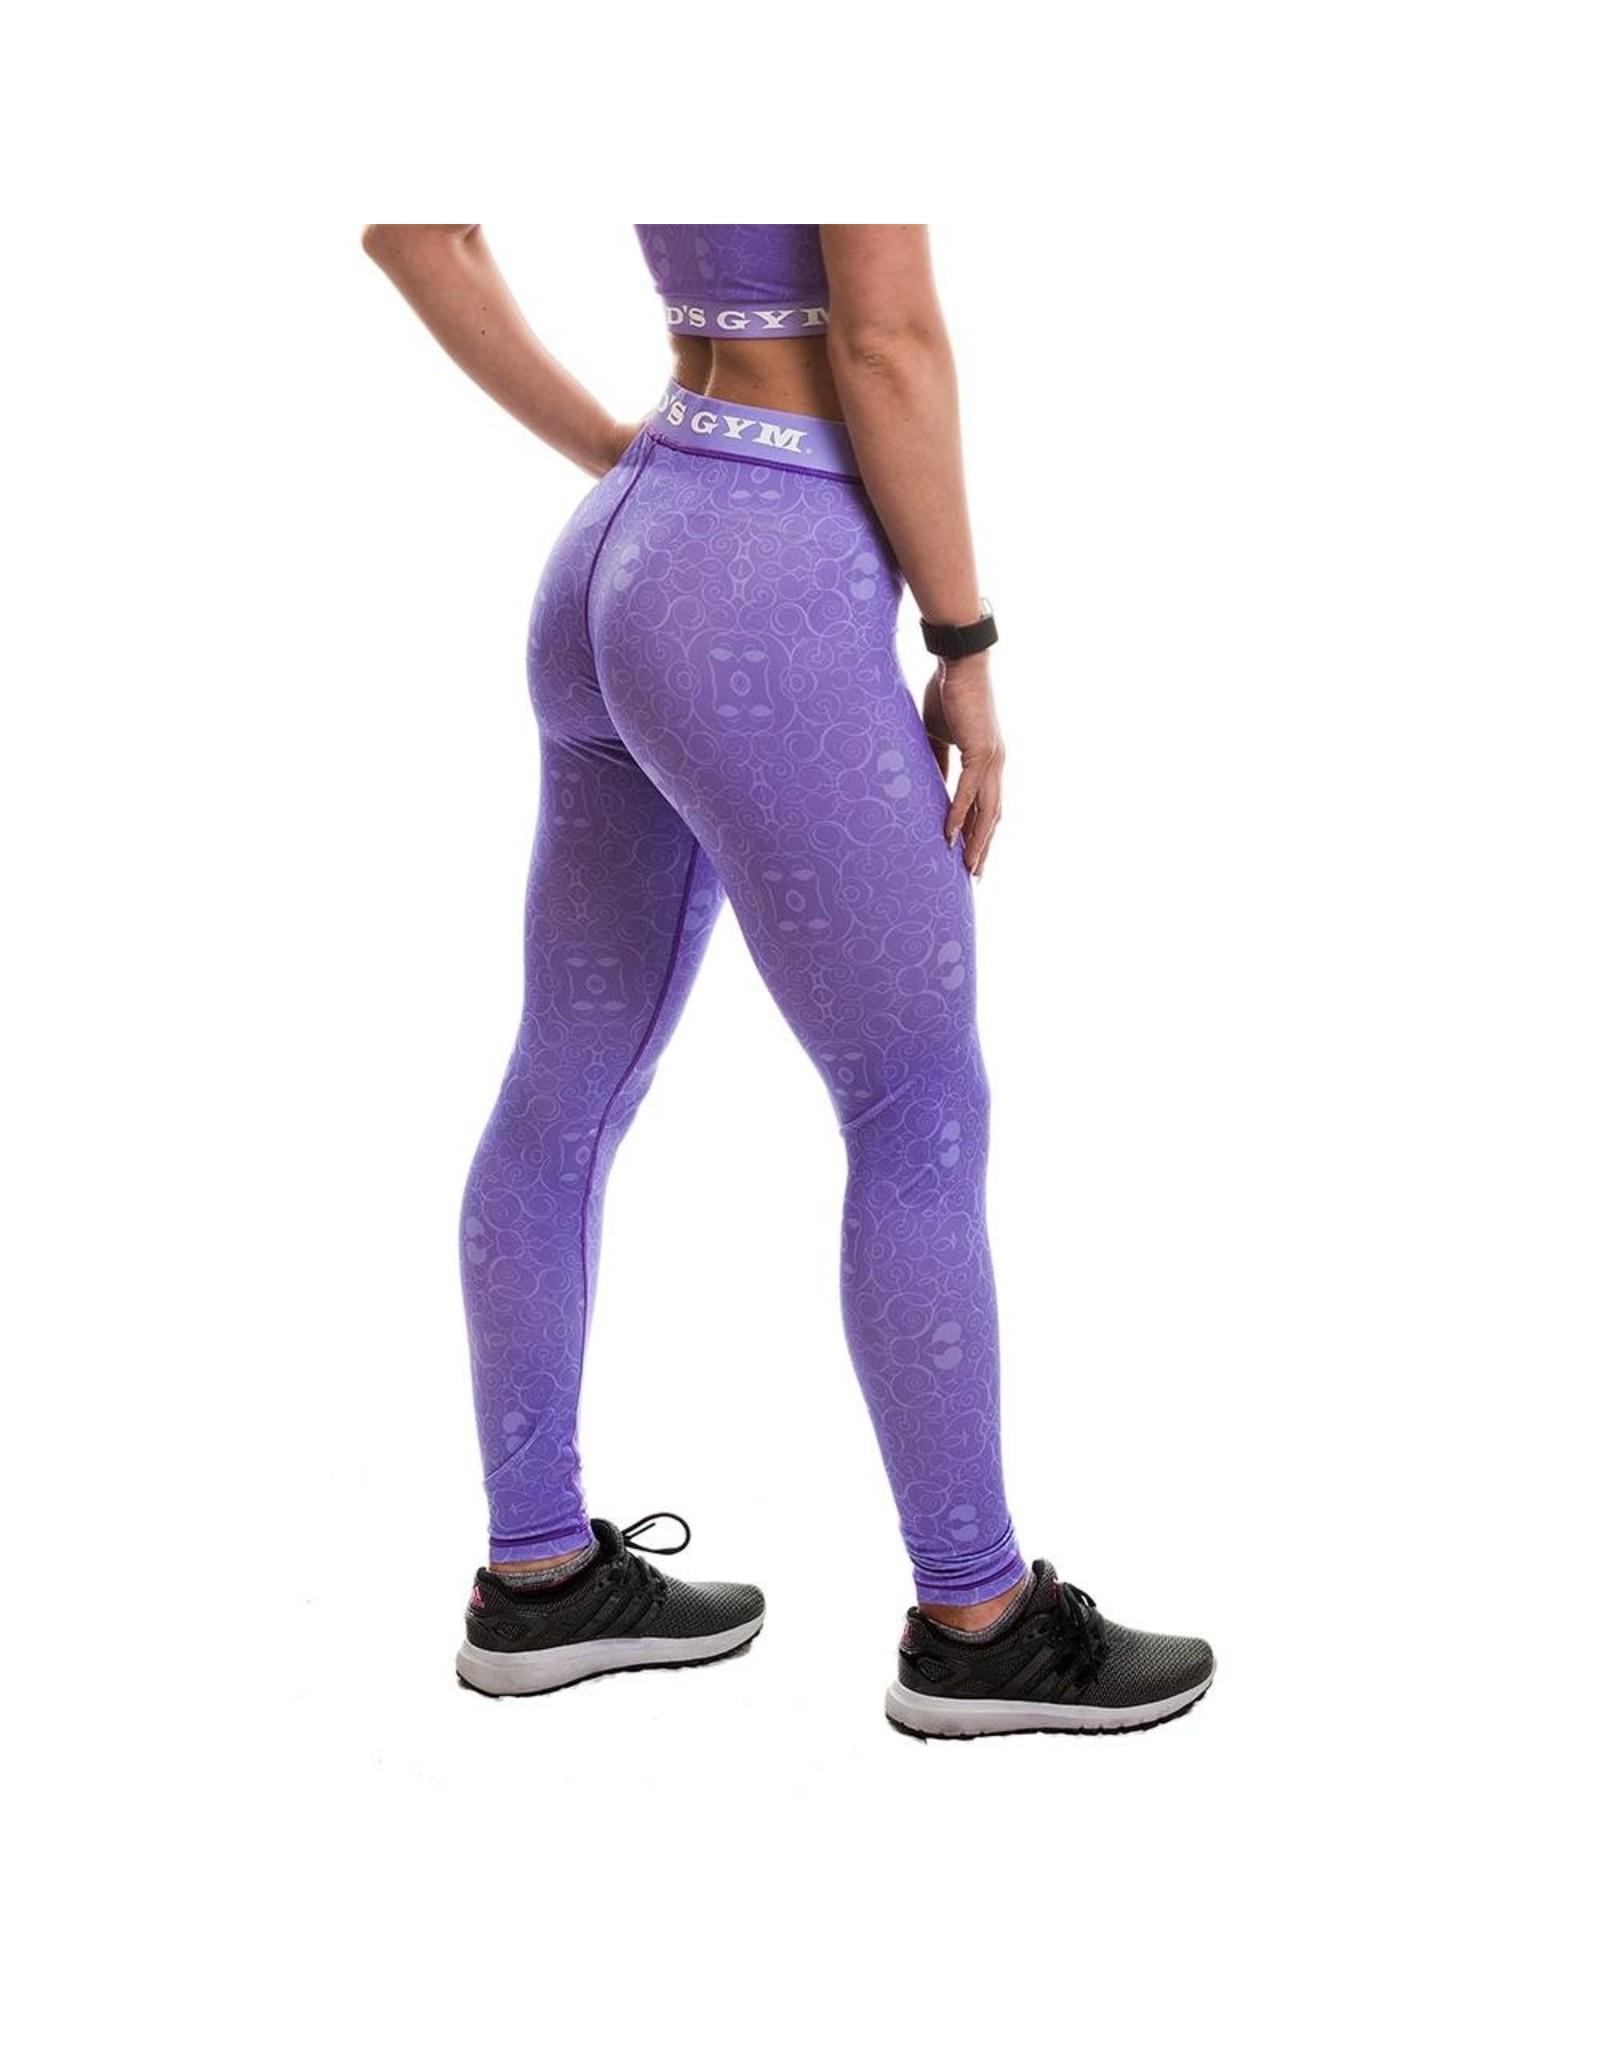 Gold's Gym Ladies Pattern Printed Gym Leggings - Lilac